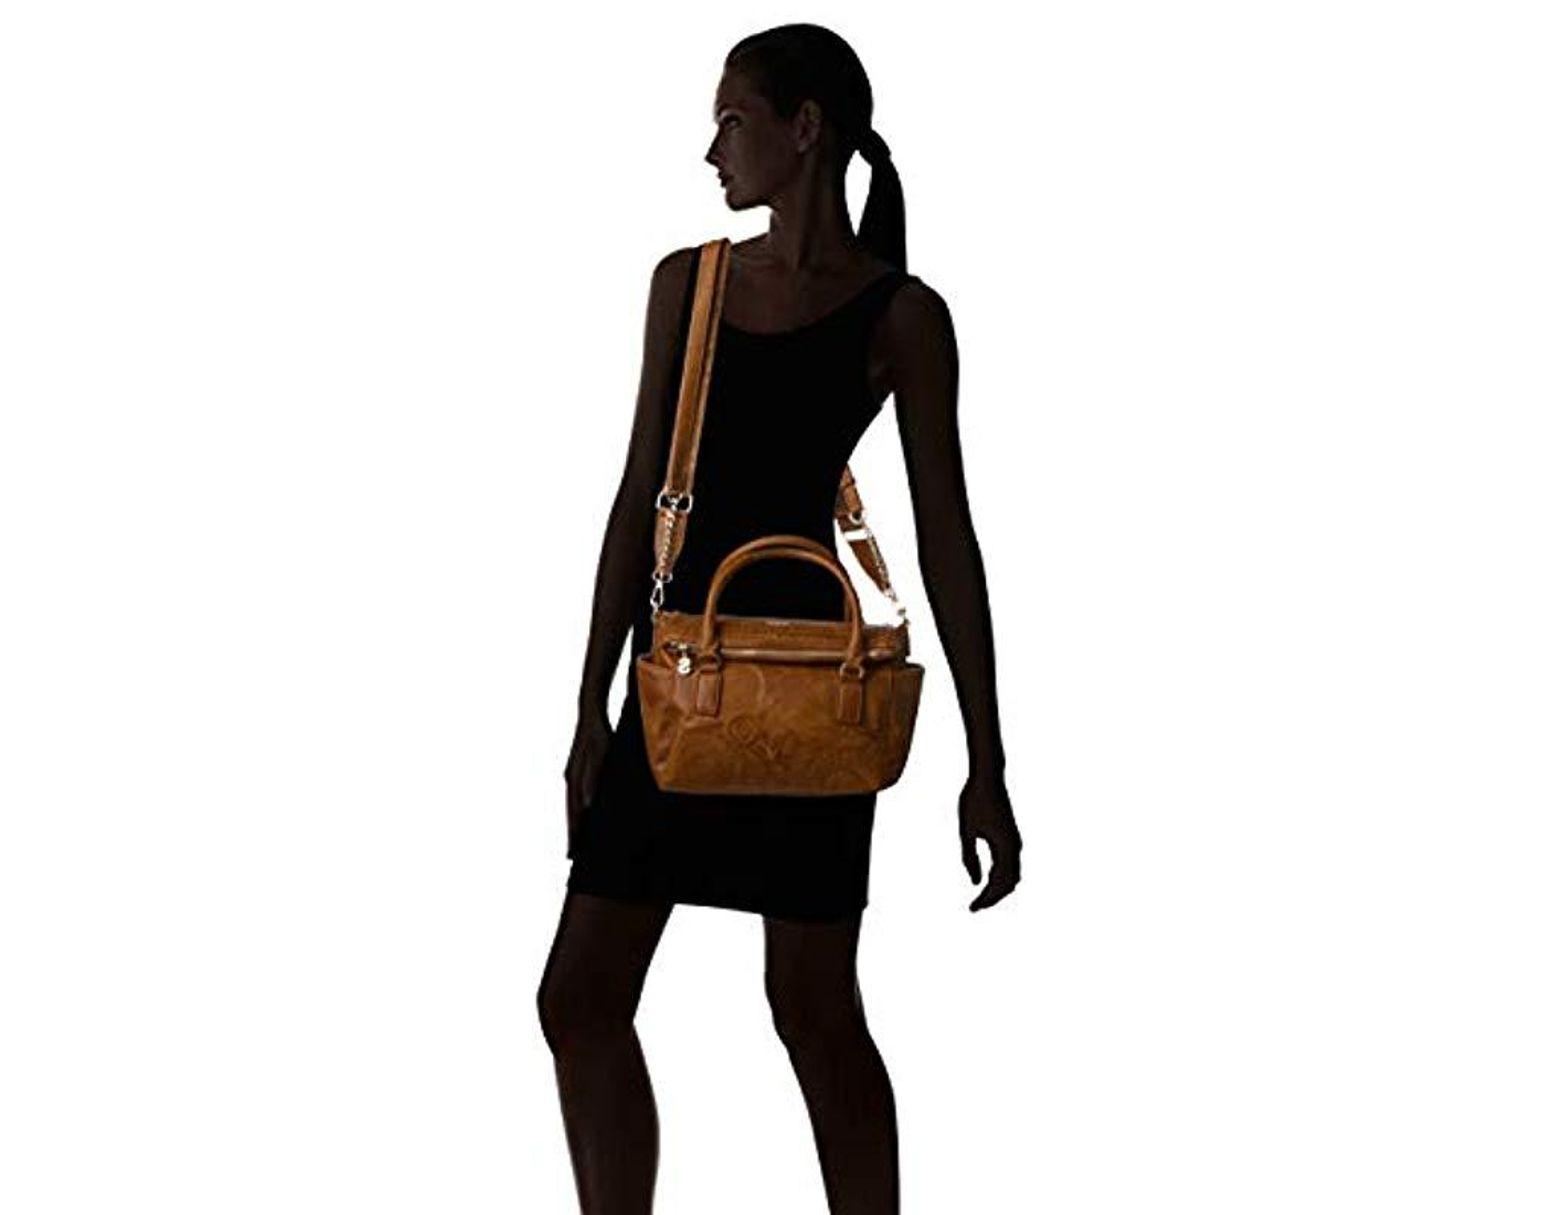 f2904c6fb9c Desigual Bols dark Amber Loverty Bag in Brown - Lyst